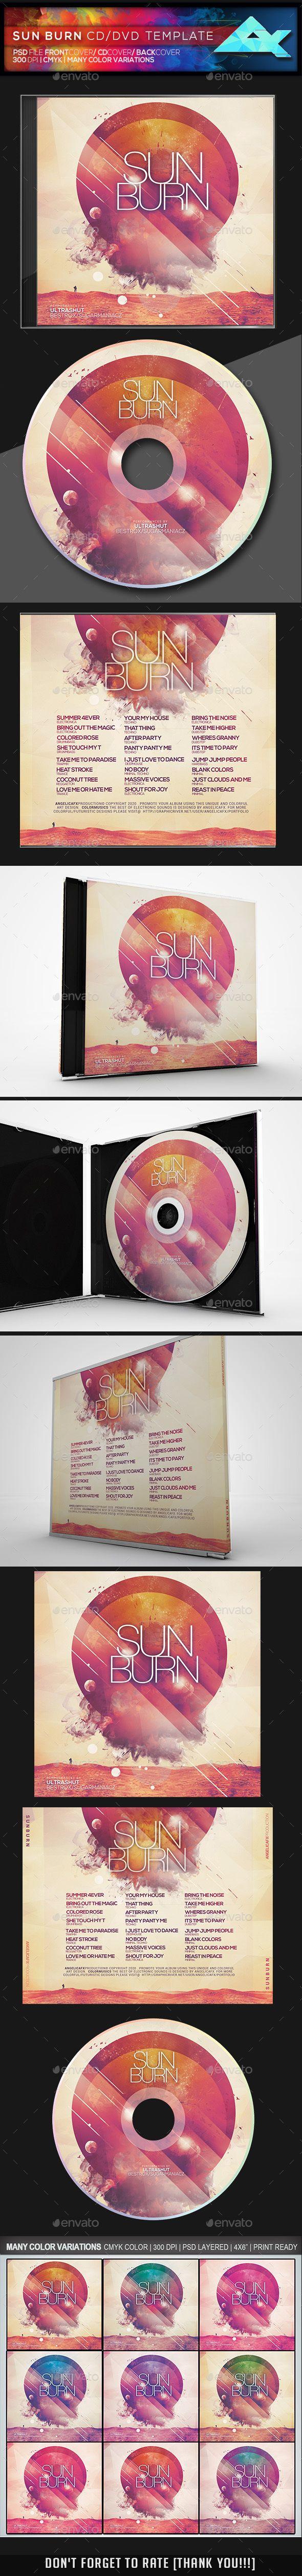 sun burn cddvd template cd dvd artwork print templates